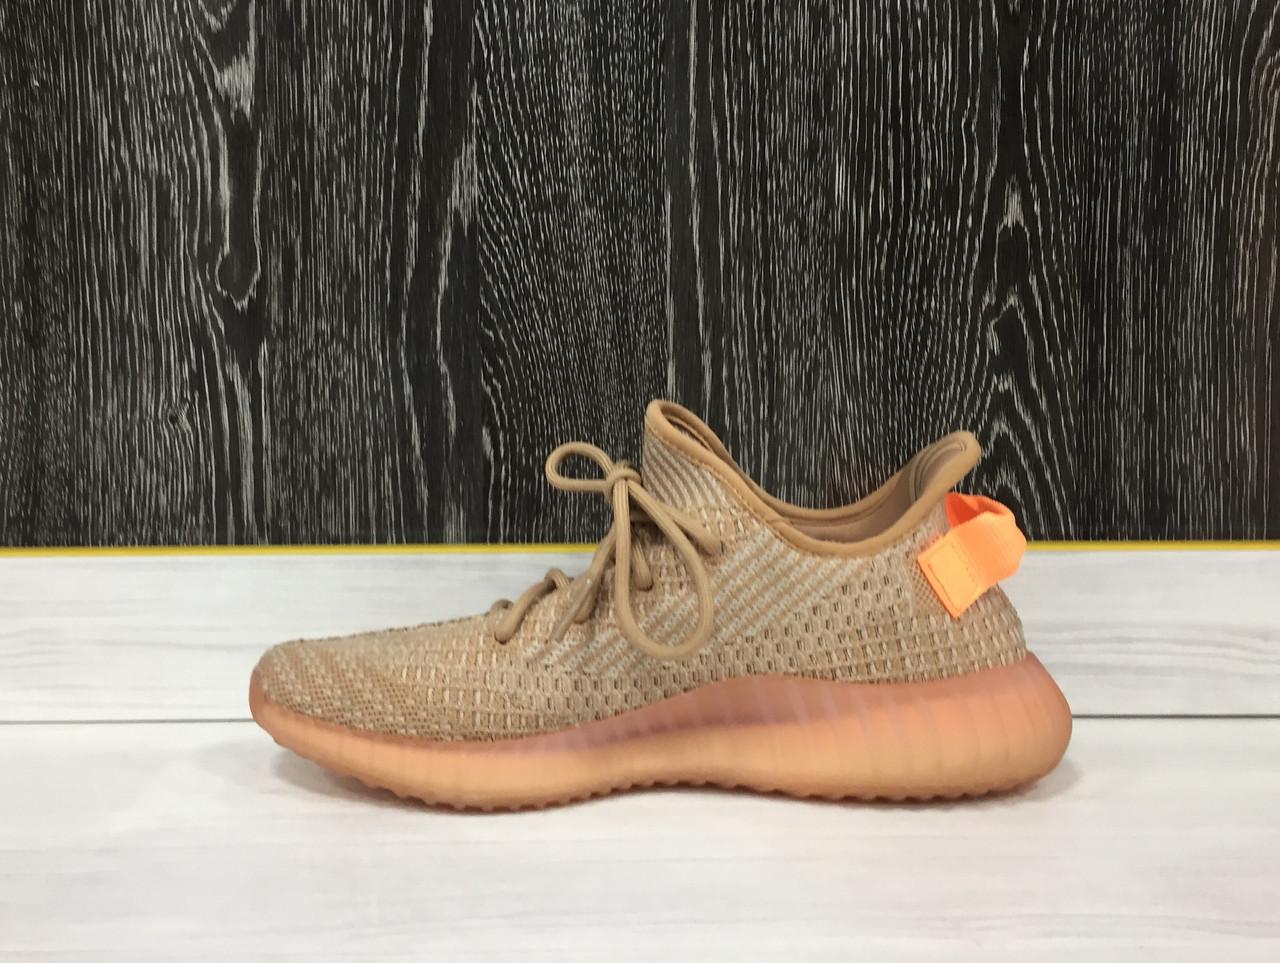 Кроссовки Adidas Yeezy Boost 350 V2 Clay (43 размер) - фото 4